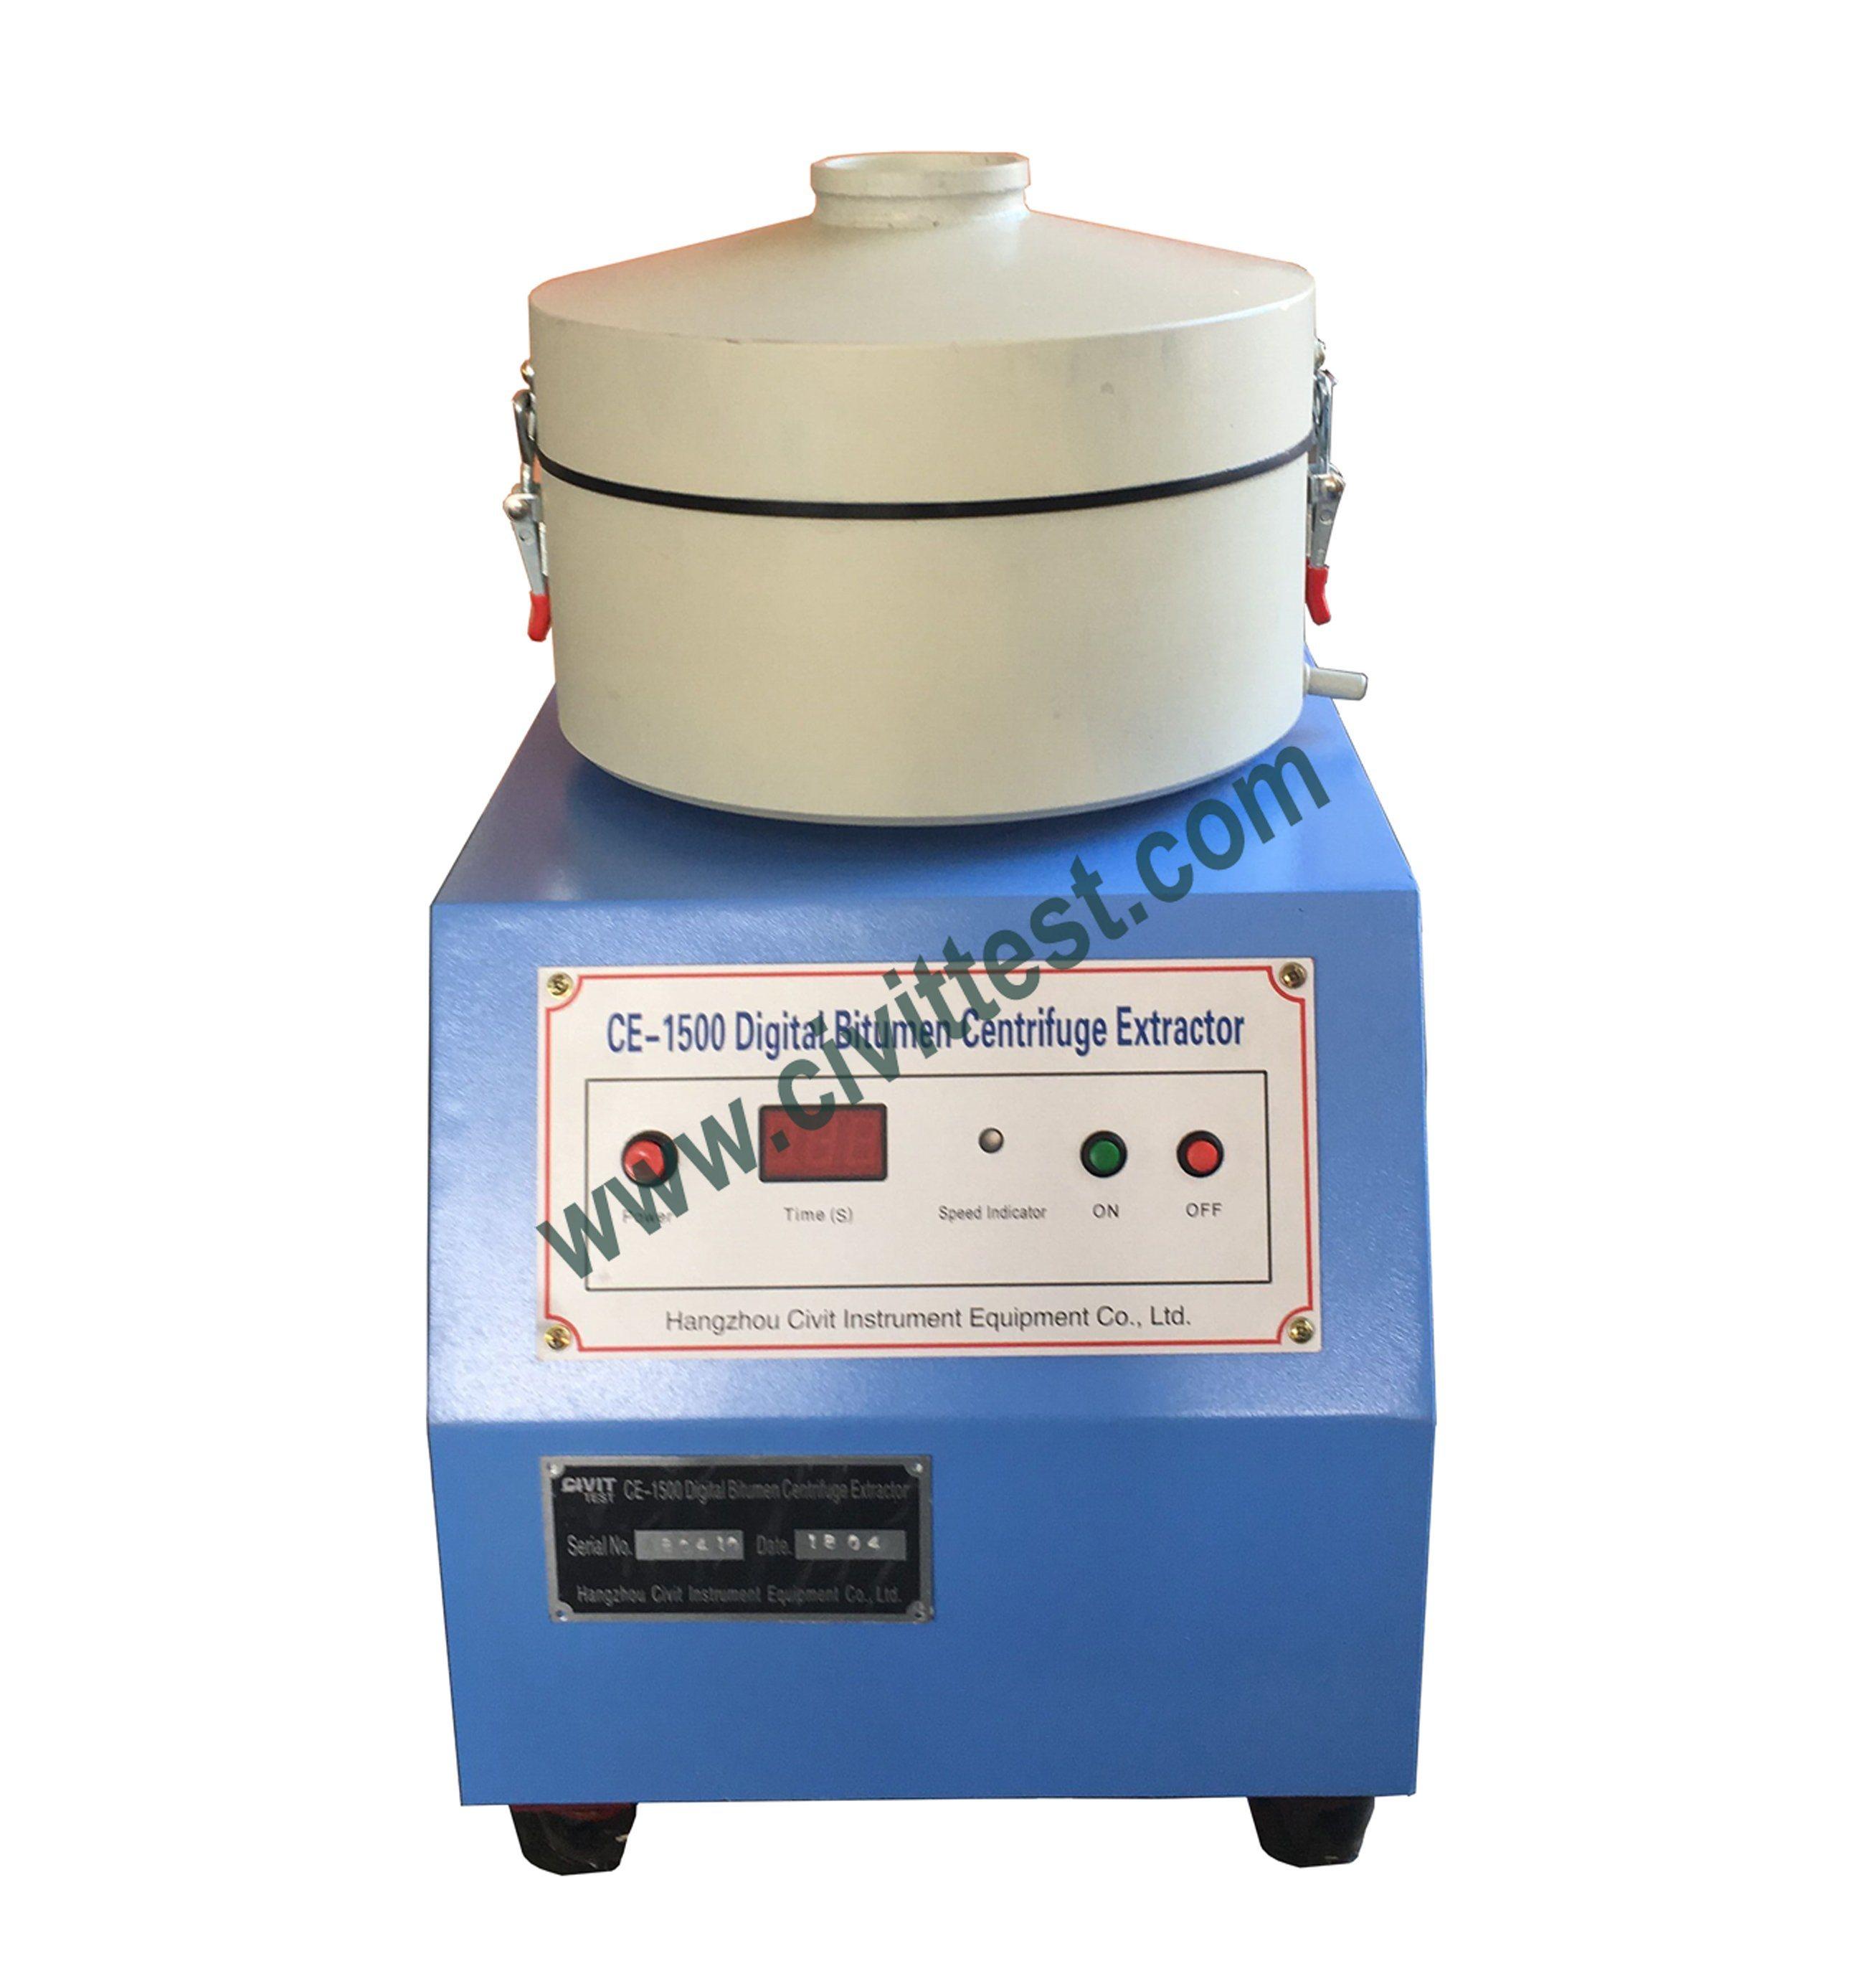 China Digital Asphalt Bitumen Centrifuge Extraction Tester Test Machine China Centrifuge Extraction Test Centrifuge Extraction